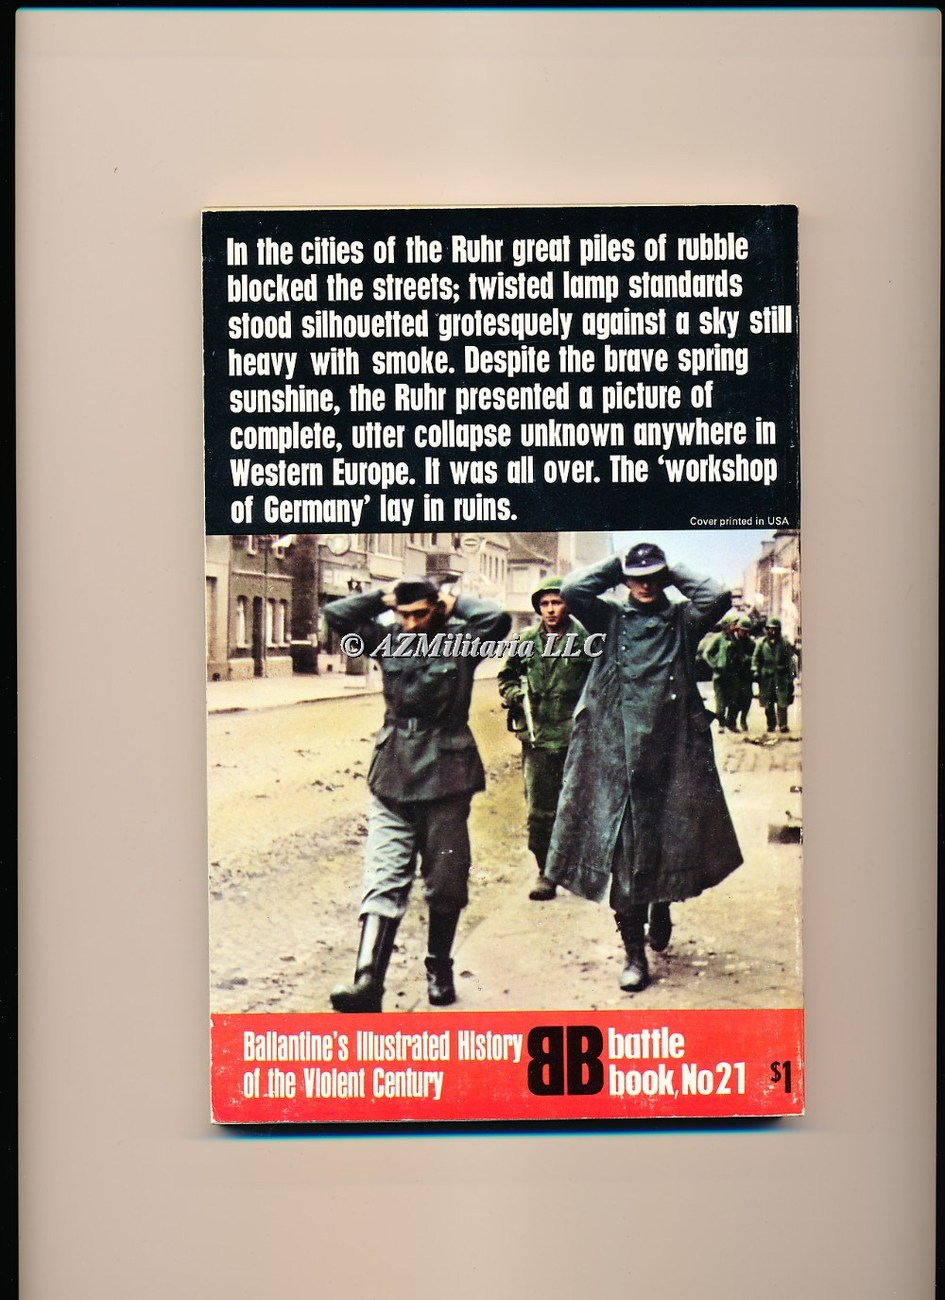 Battle of the Ruhr Pocket (Battle Book No 21)